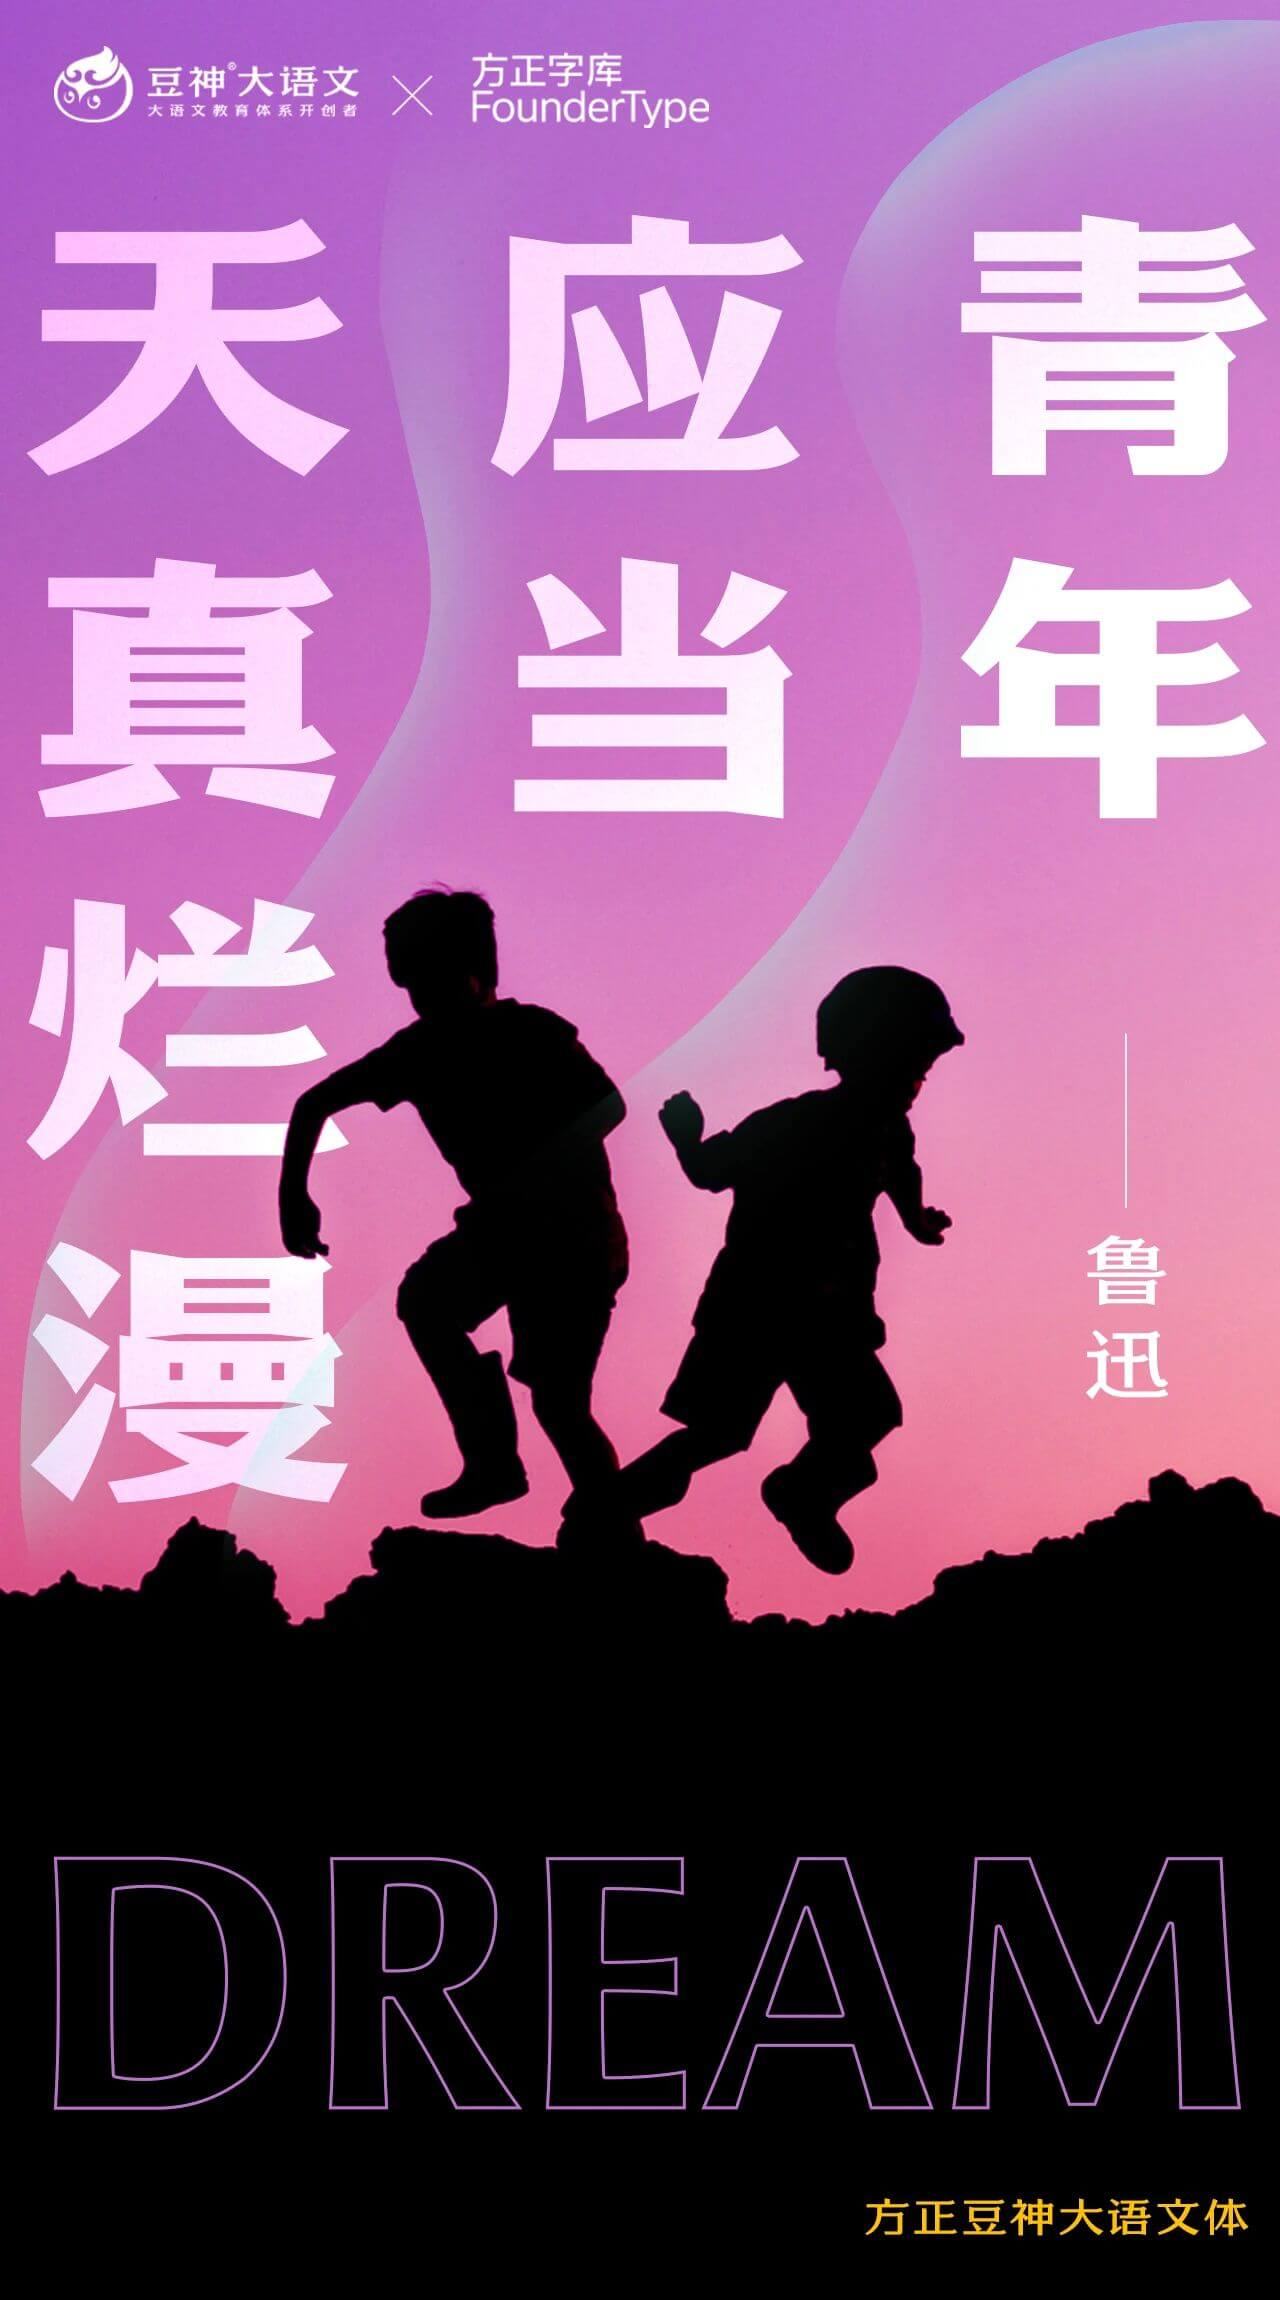 https://cdn1.zijia.com.cn/Public/Uploads/mainsort/mainsort_1599203179_9372.jpg